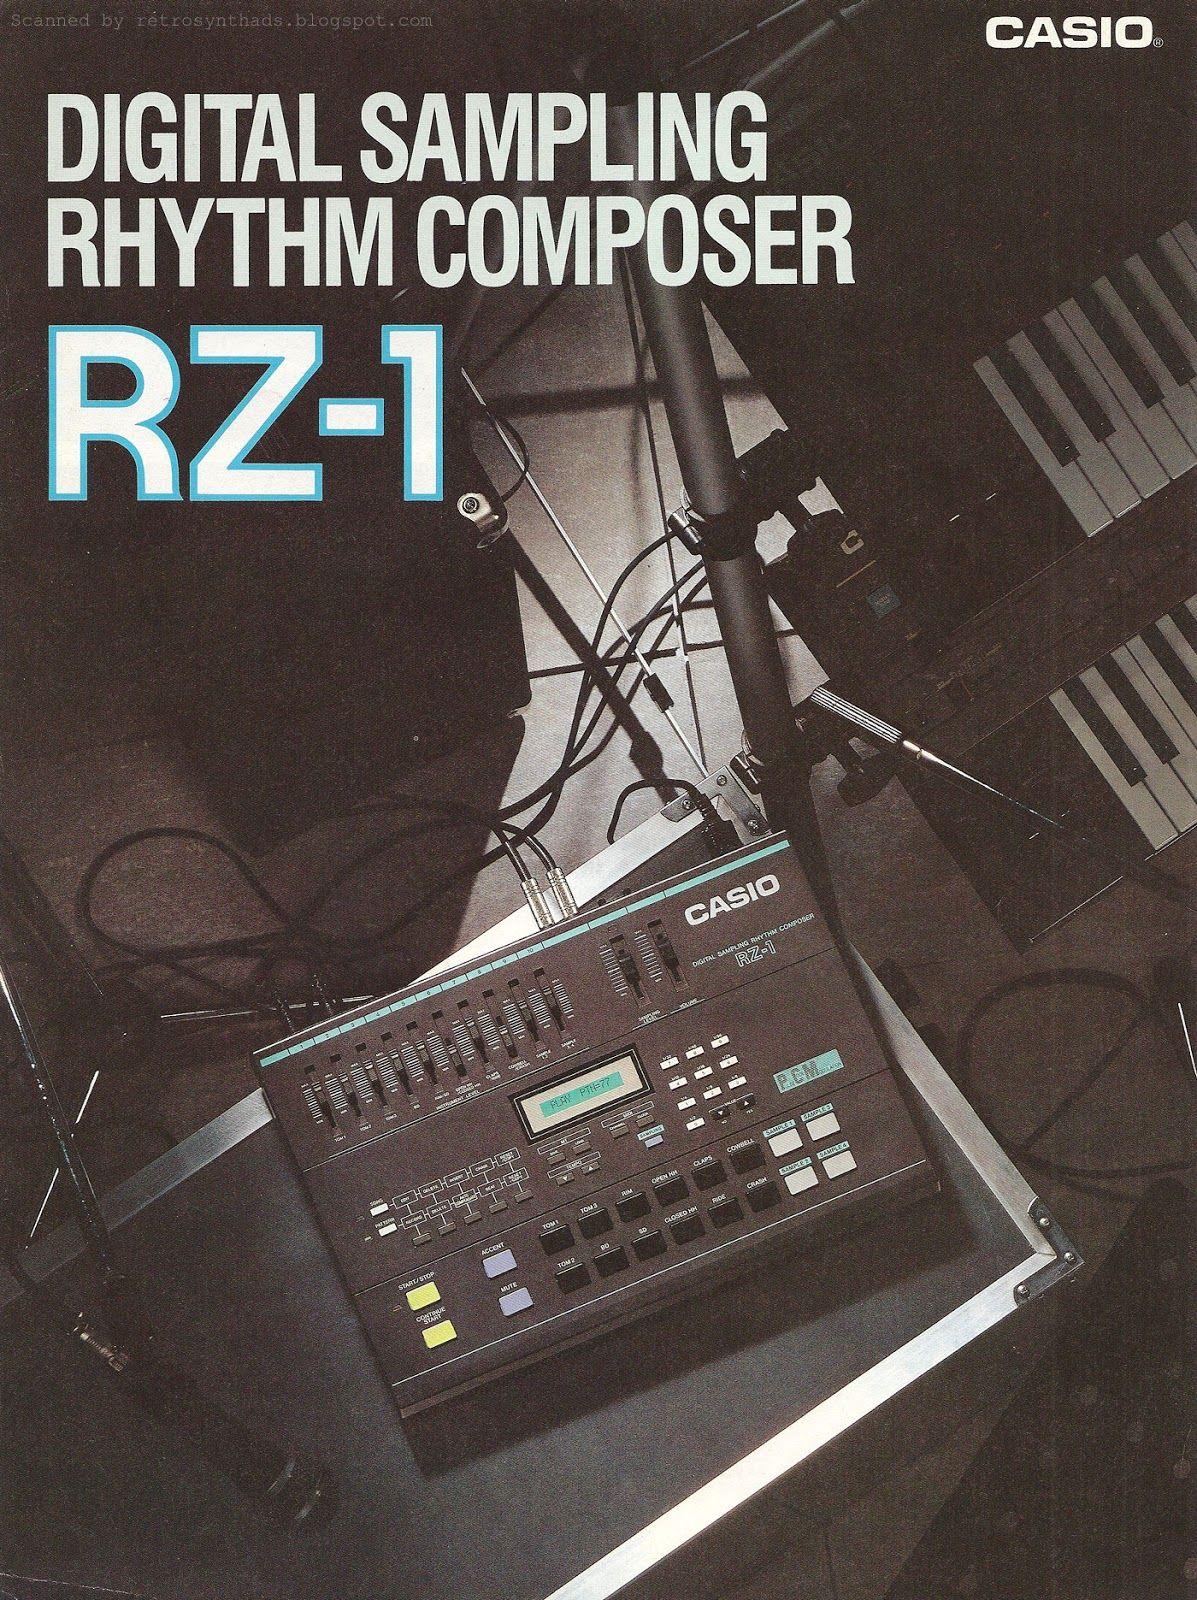 Casio RZ-1 Digital Sampling Rhythm Composer Launched in 1986  (A